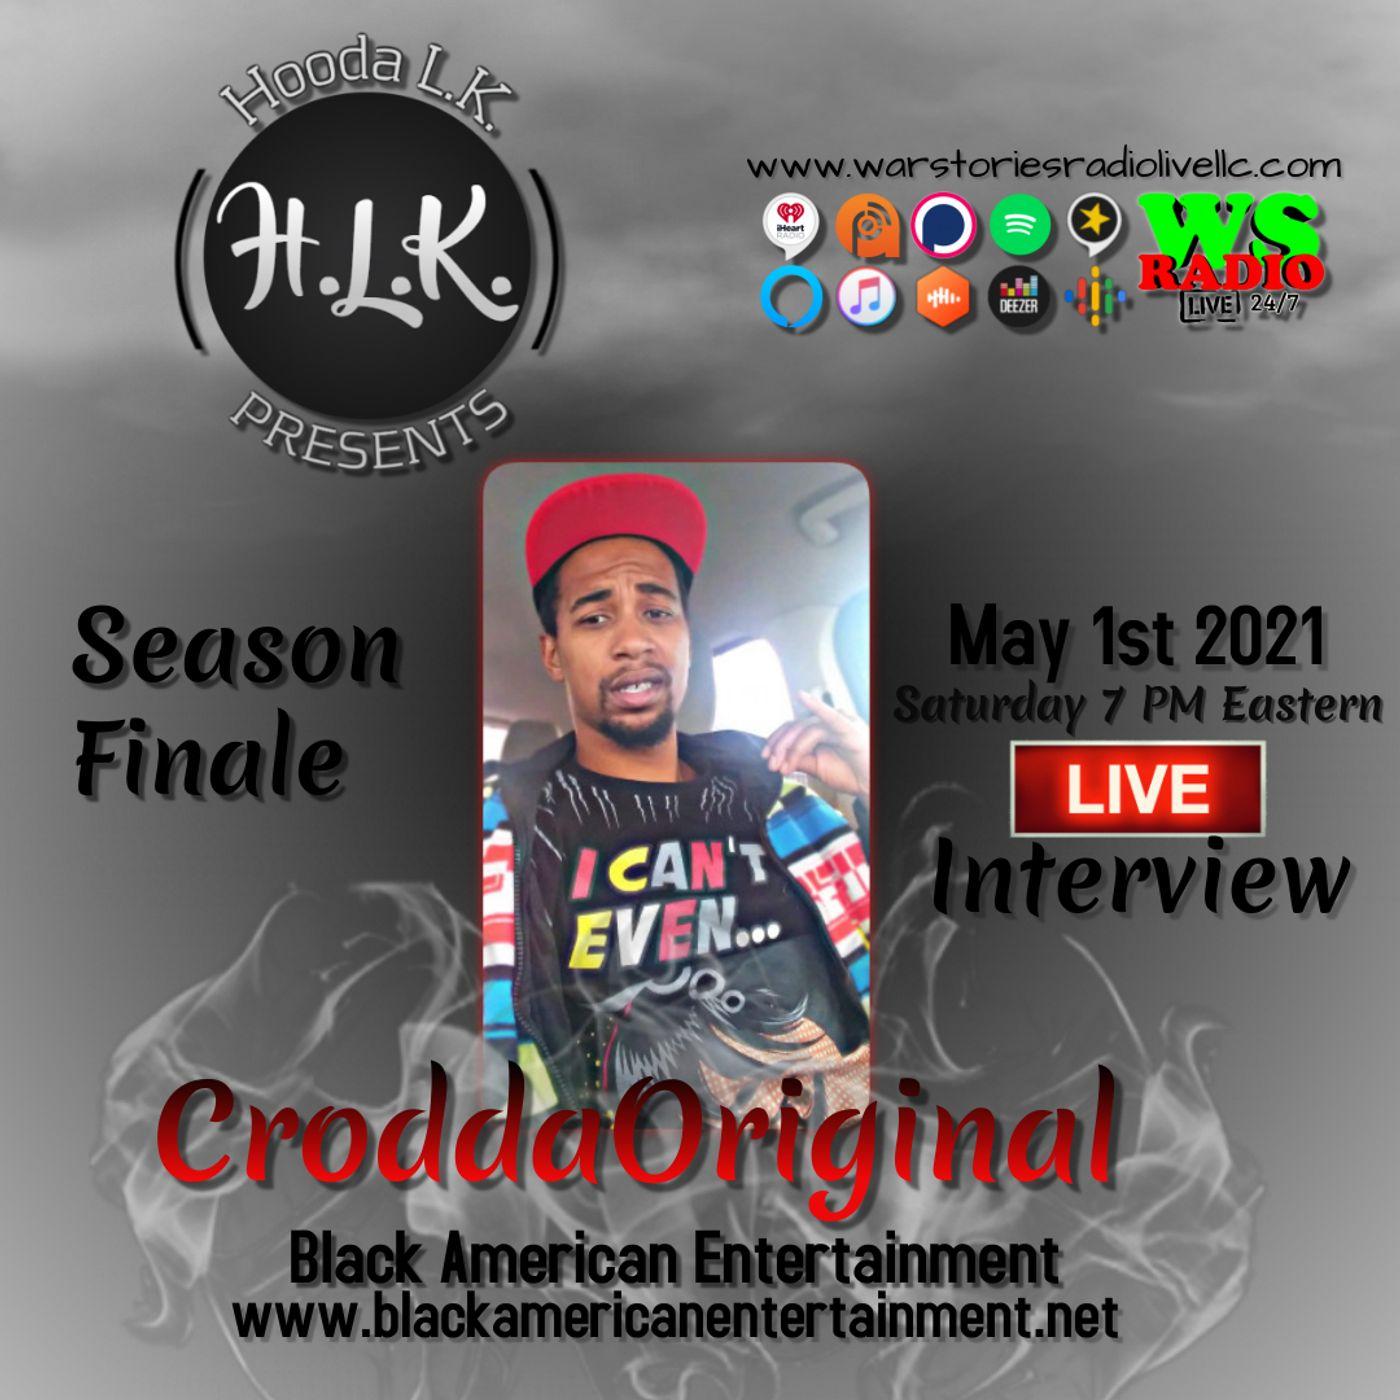 Hooda LK Presents | CRoddaoriginal